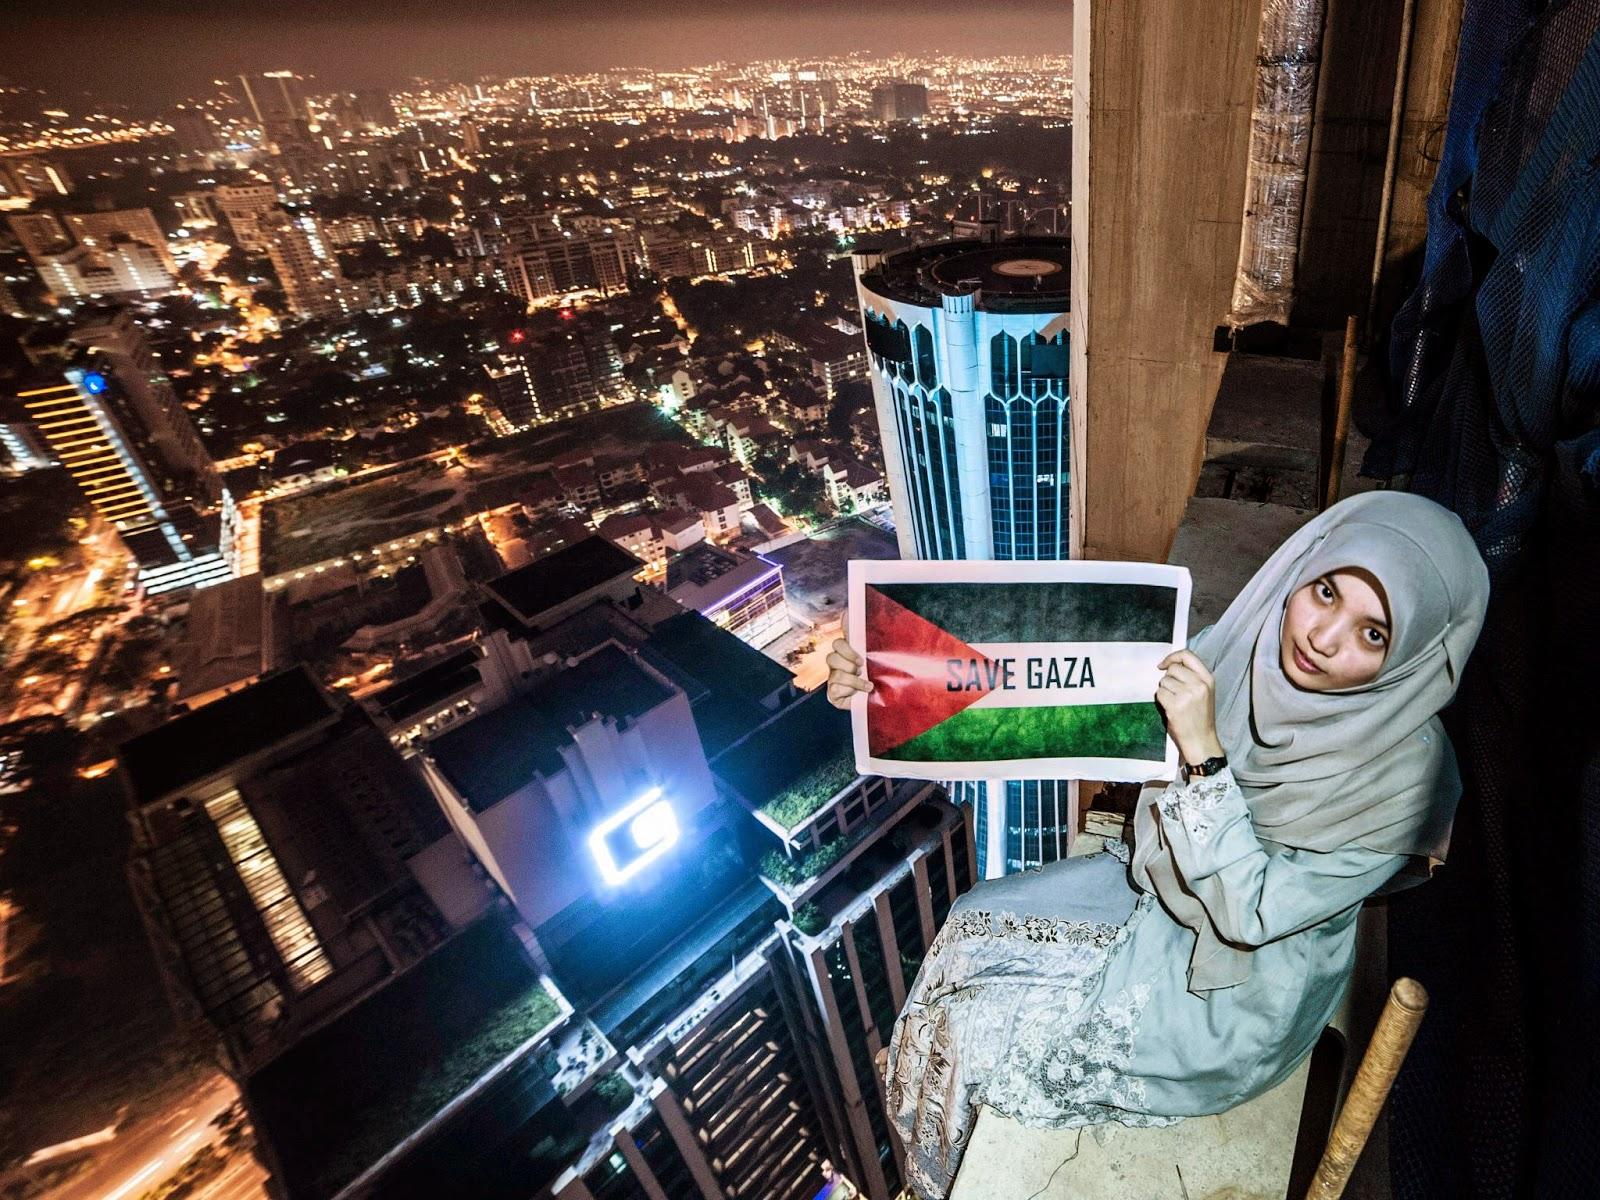 Kisah Di Sebalik Gadis Kebaya Di Pencakar Langit Dengan Mesej Gaza.